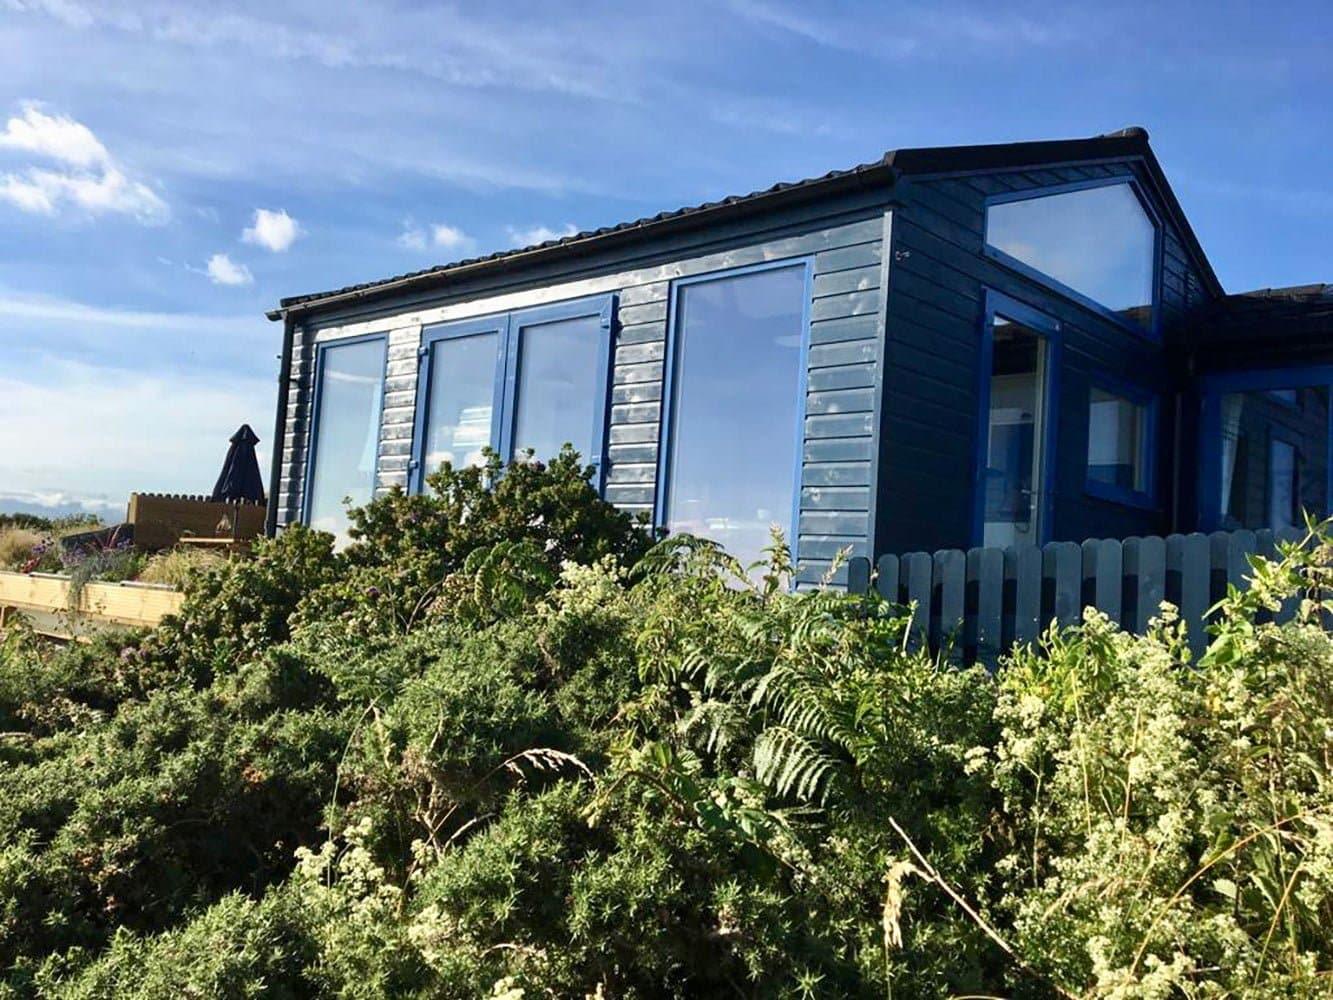 Thorndown-Bishop-Blue-wood-paint-on-cladding